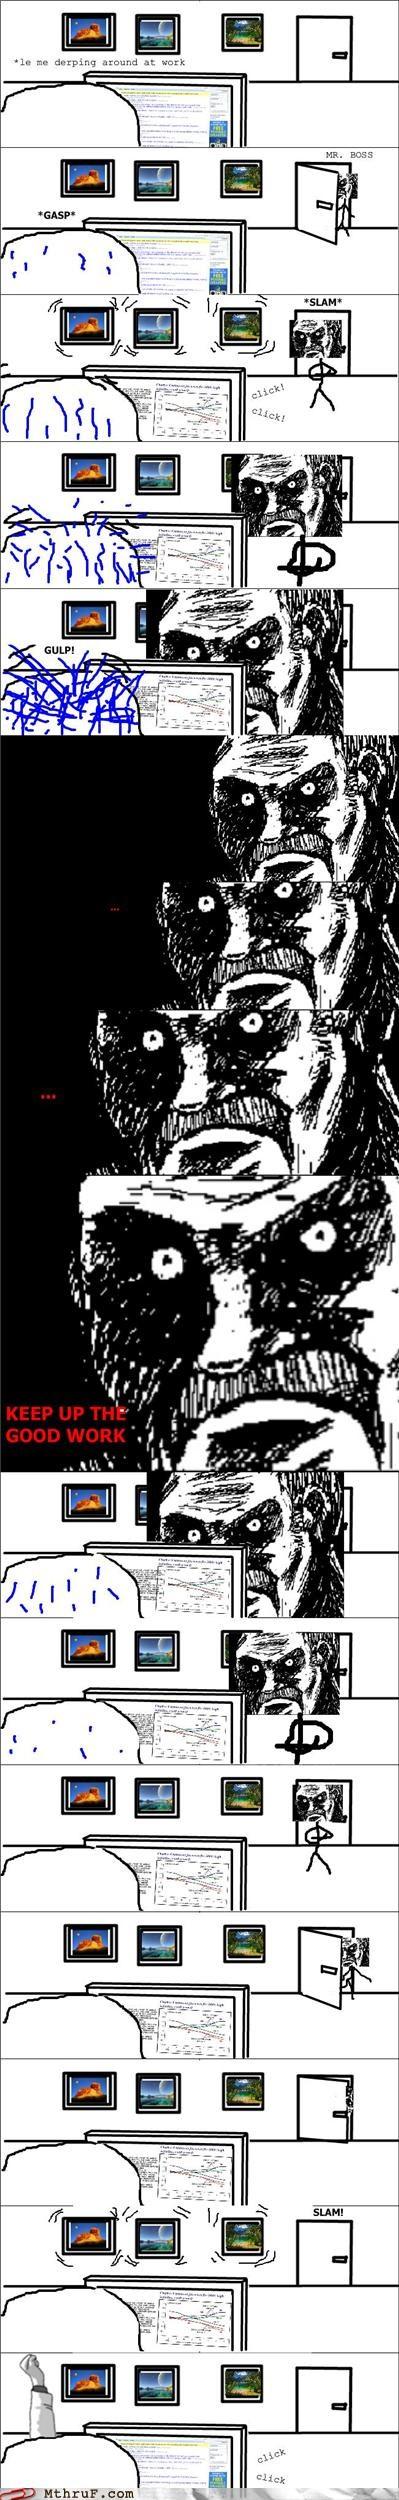 boss comic manager procrastination rage comic - 5230275584